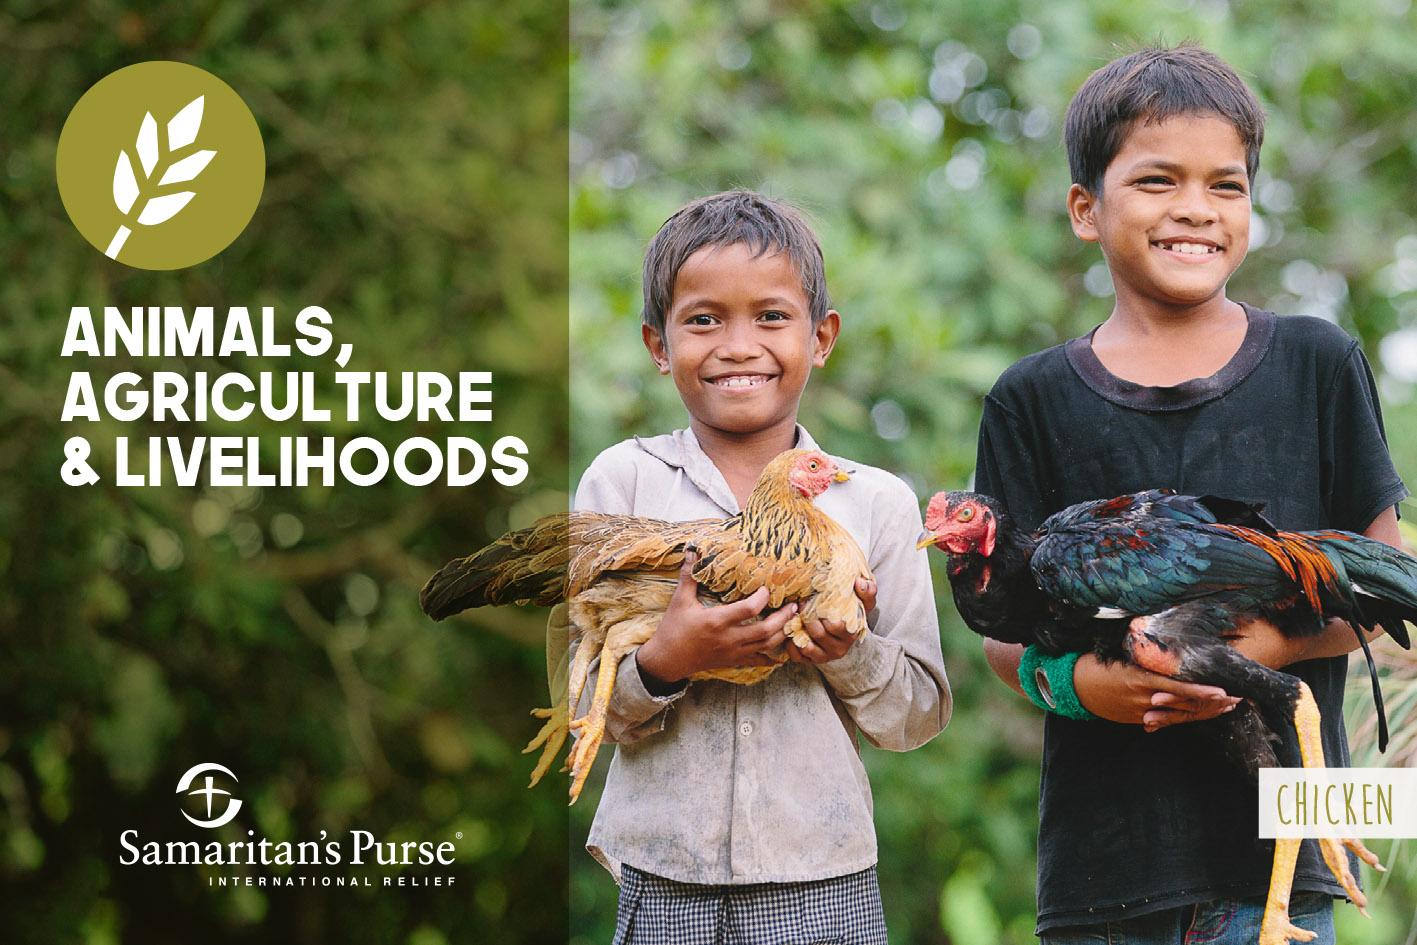 Gift Catalogue Postcards - Samaritan's Purse AU/NZ